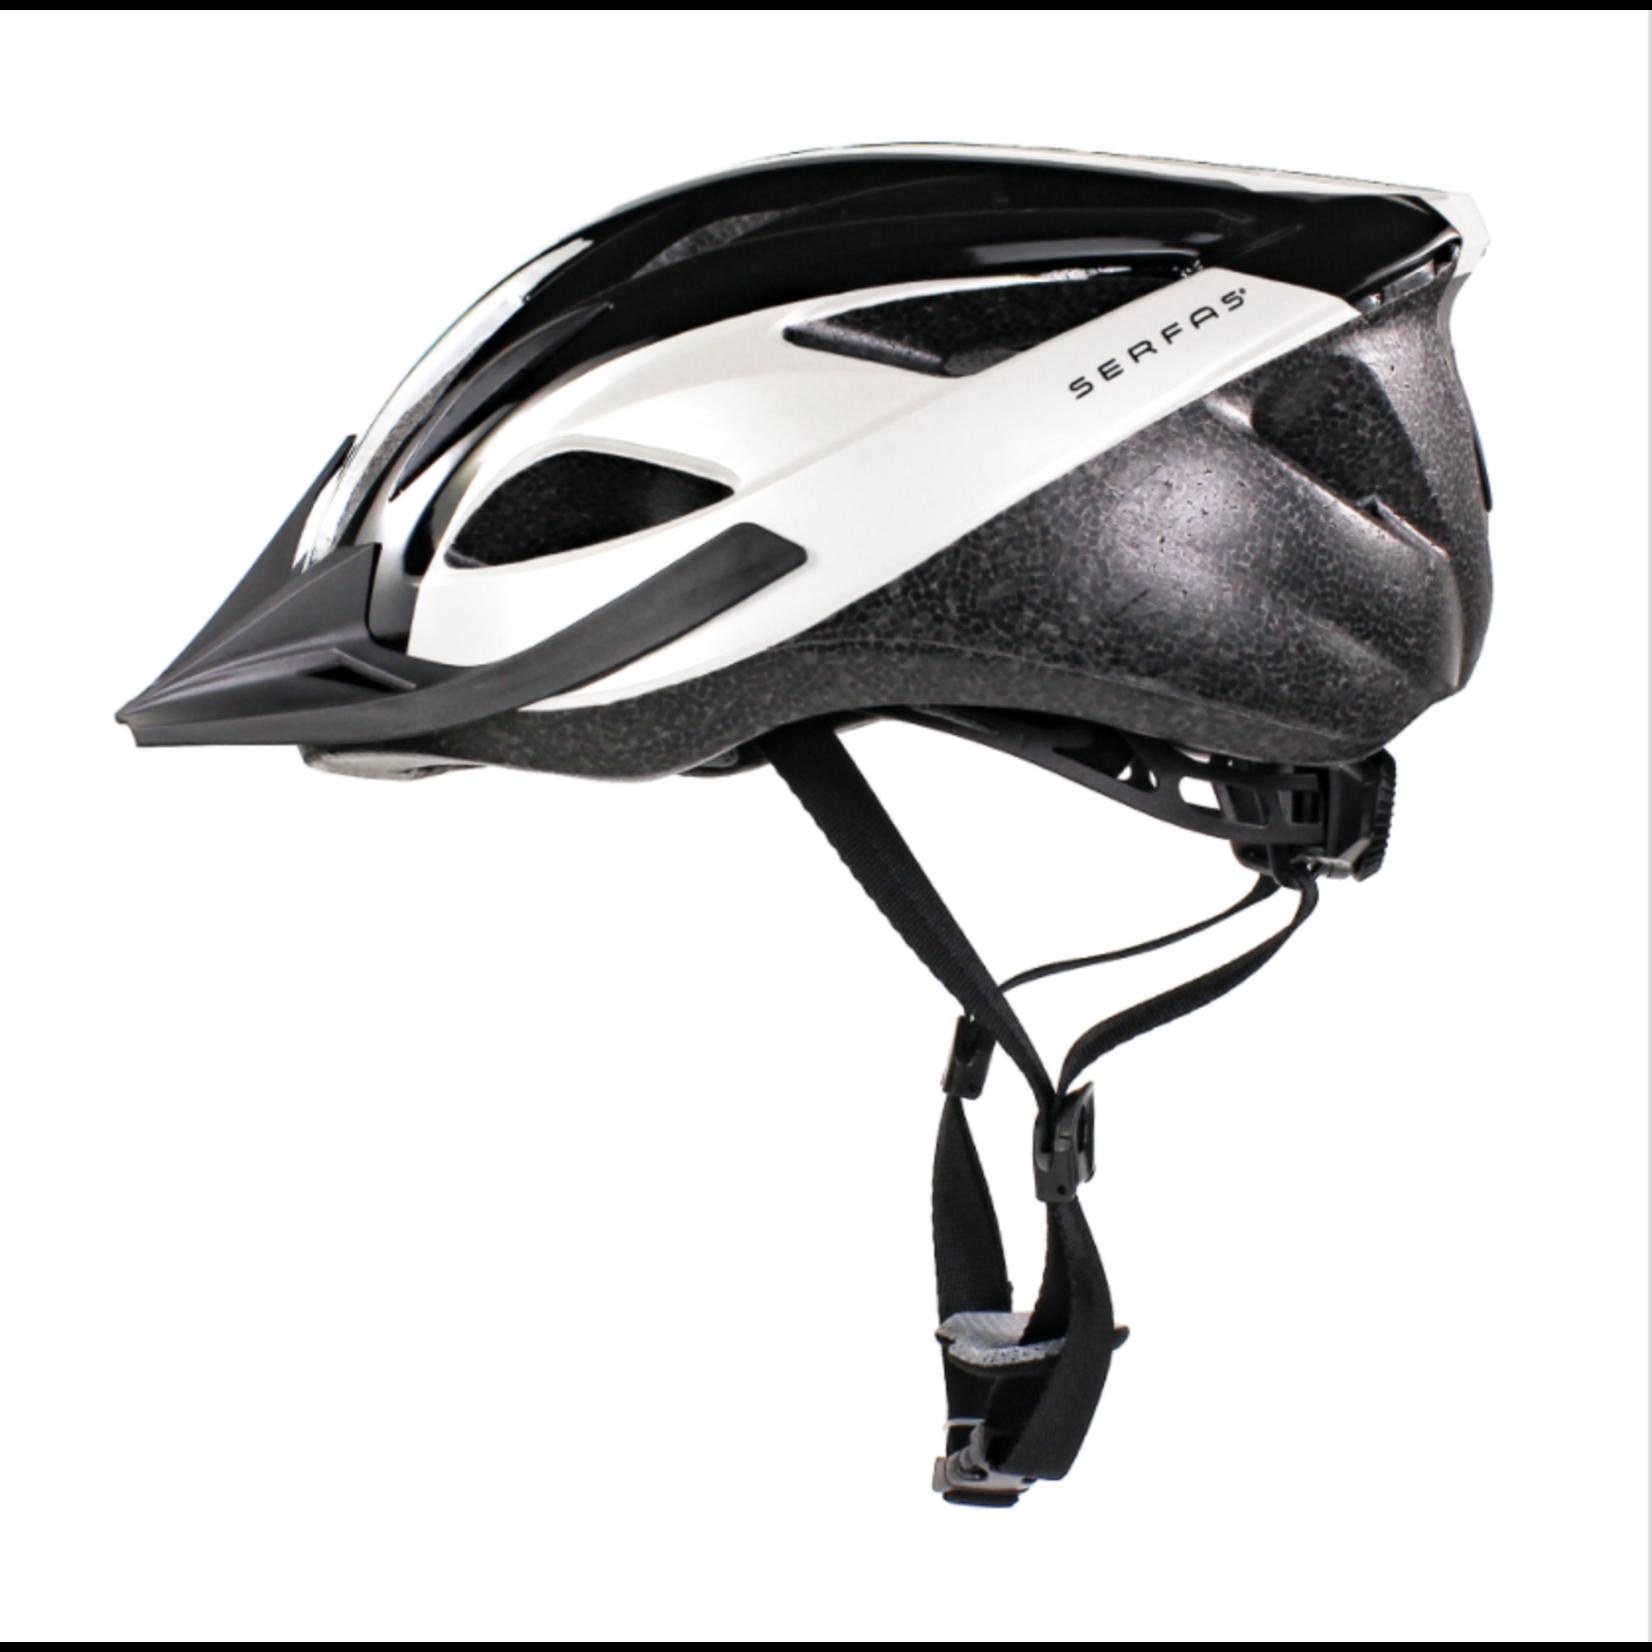 SERFAS Helmet HT-200WTBK Karv Gloss WHT/BLK SM/MD (SERFAS)